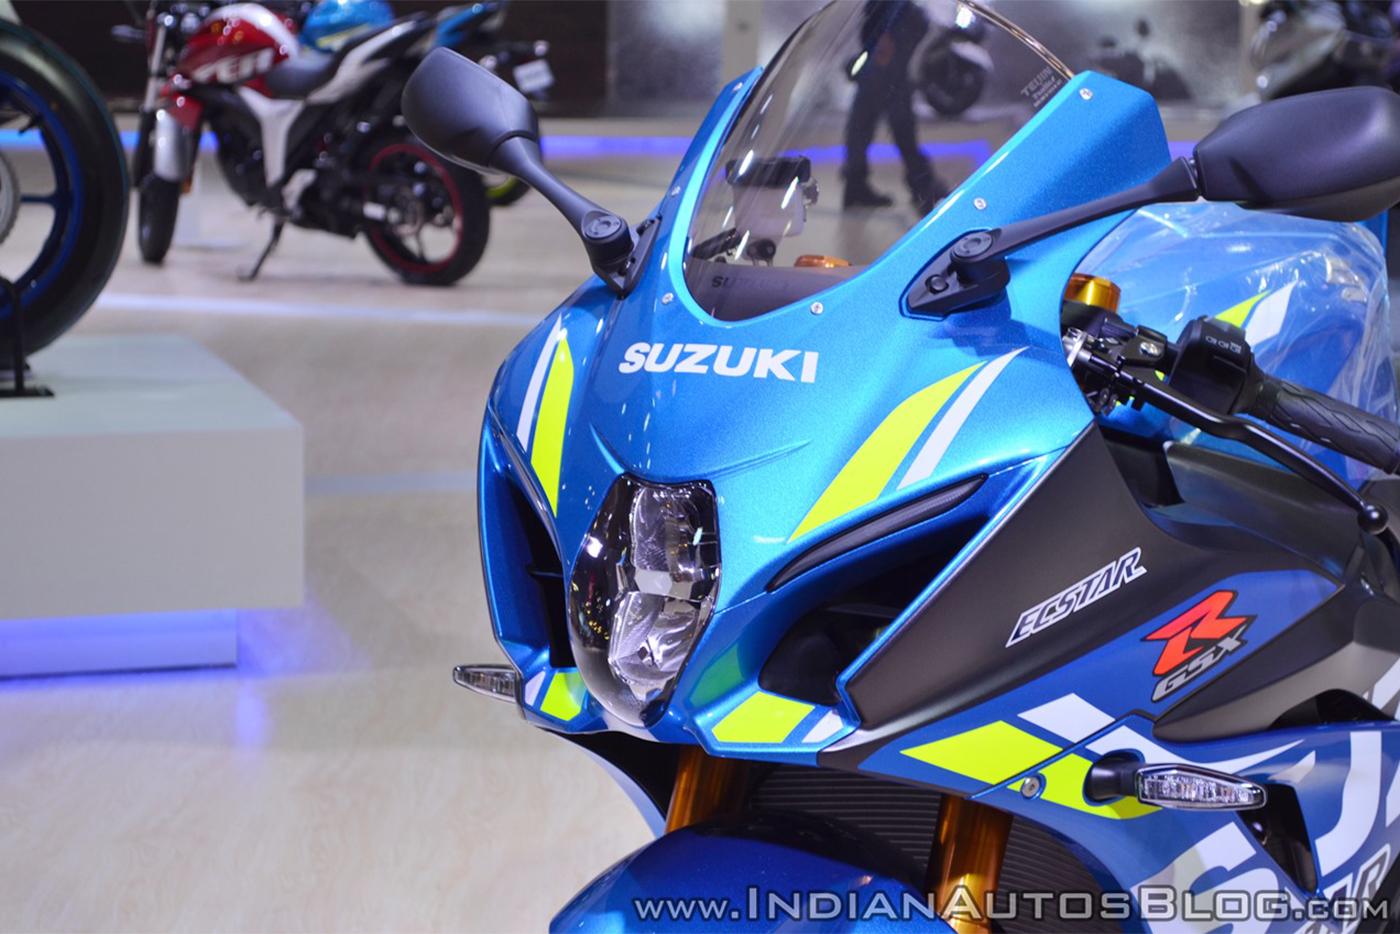 2018-suzuki-gsx-r1000r-blue-headlight-at-2018-auto-expo.jpg